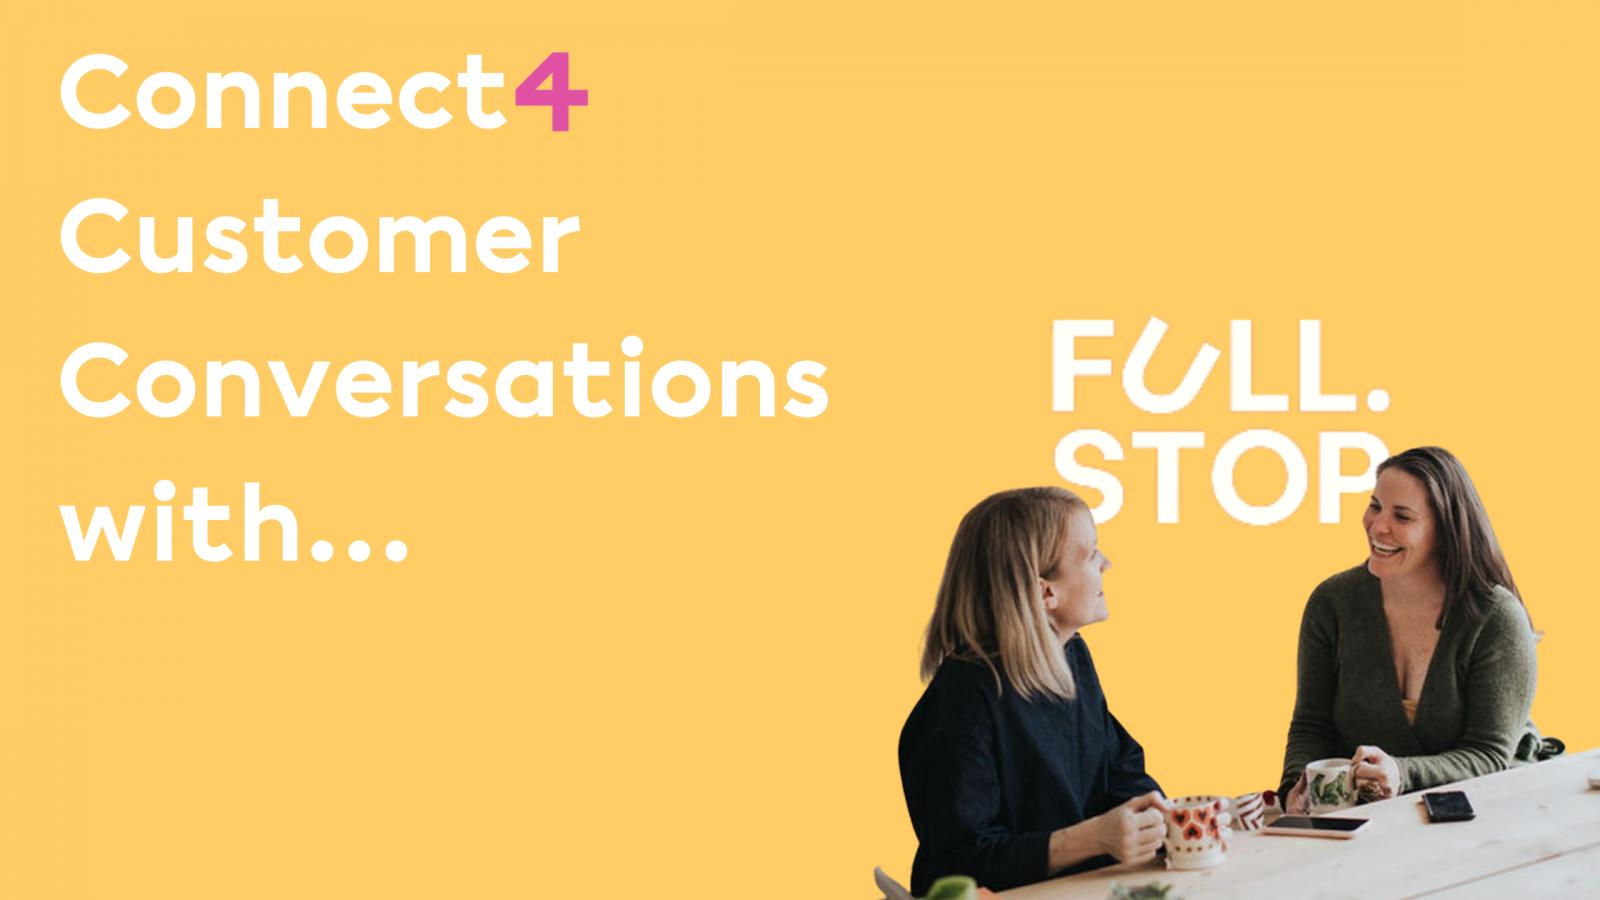 Customer Conversations Full-Stop